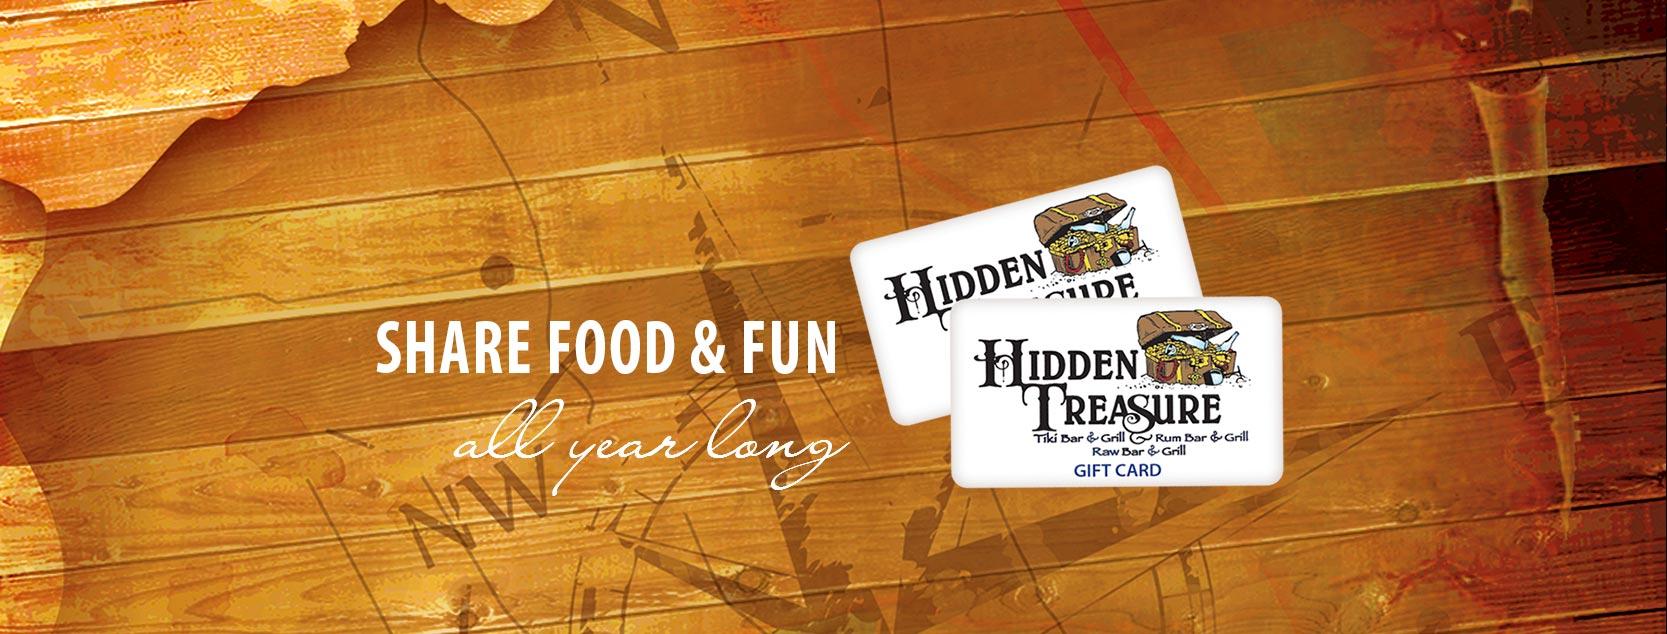 hidden treasure gift cards promo